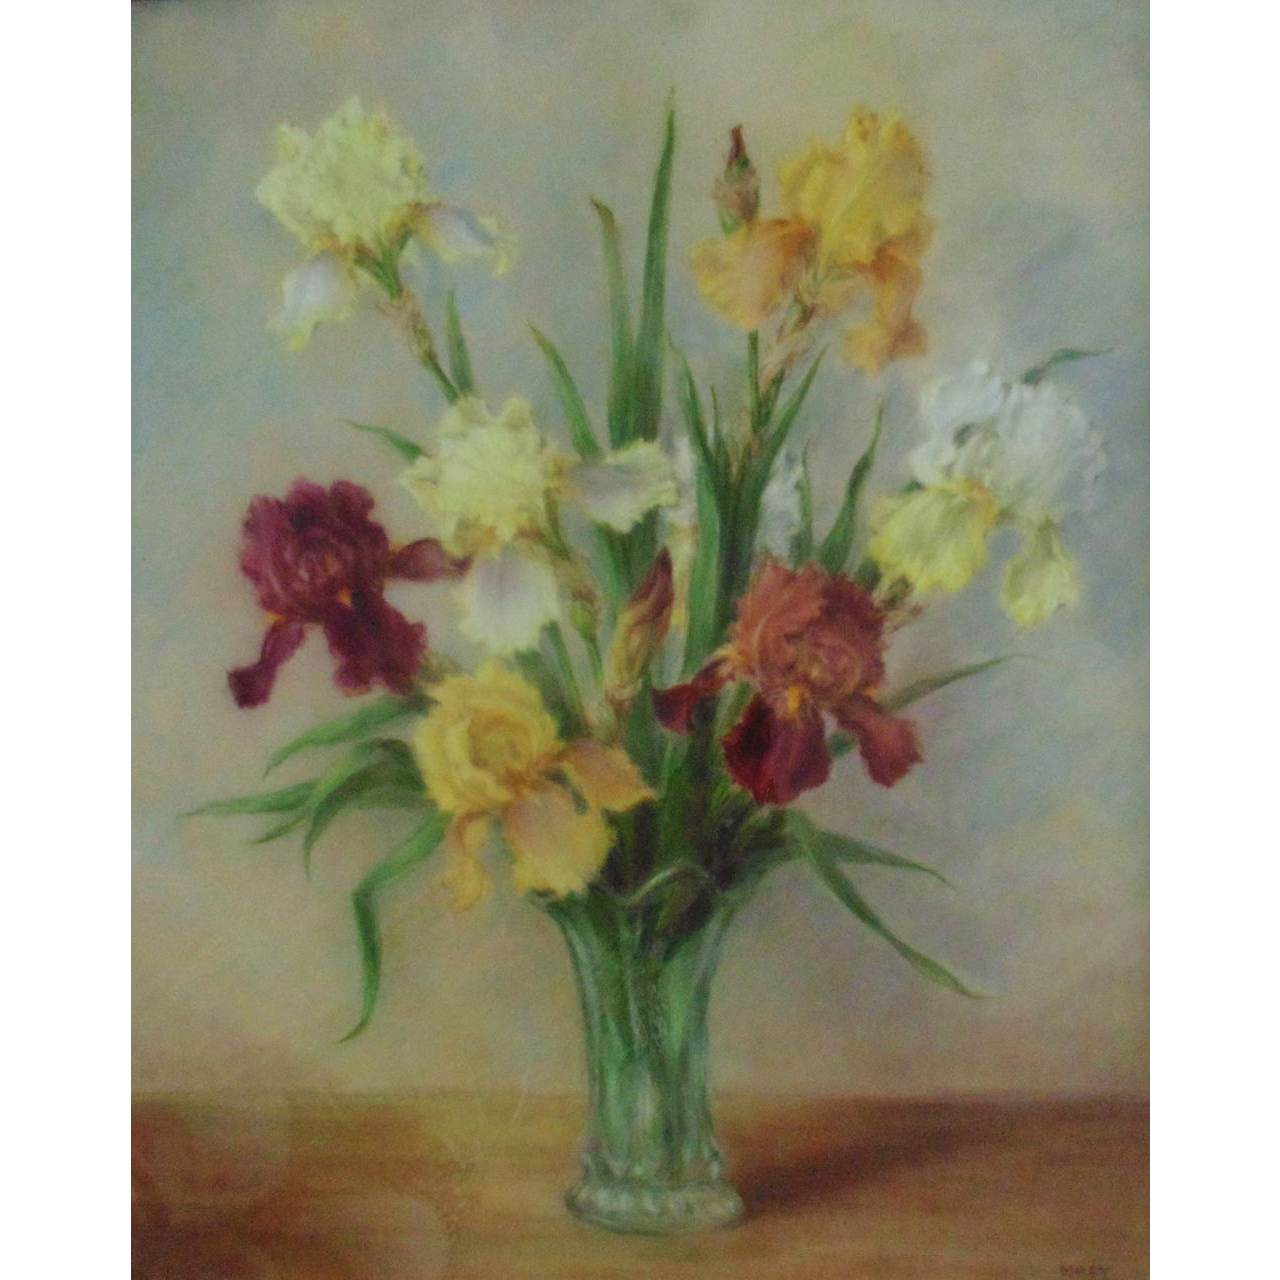 Pastel Iris Irises Painting Flowers Floral Mid Century Modern Signed